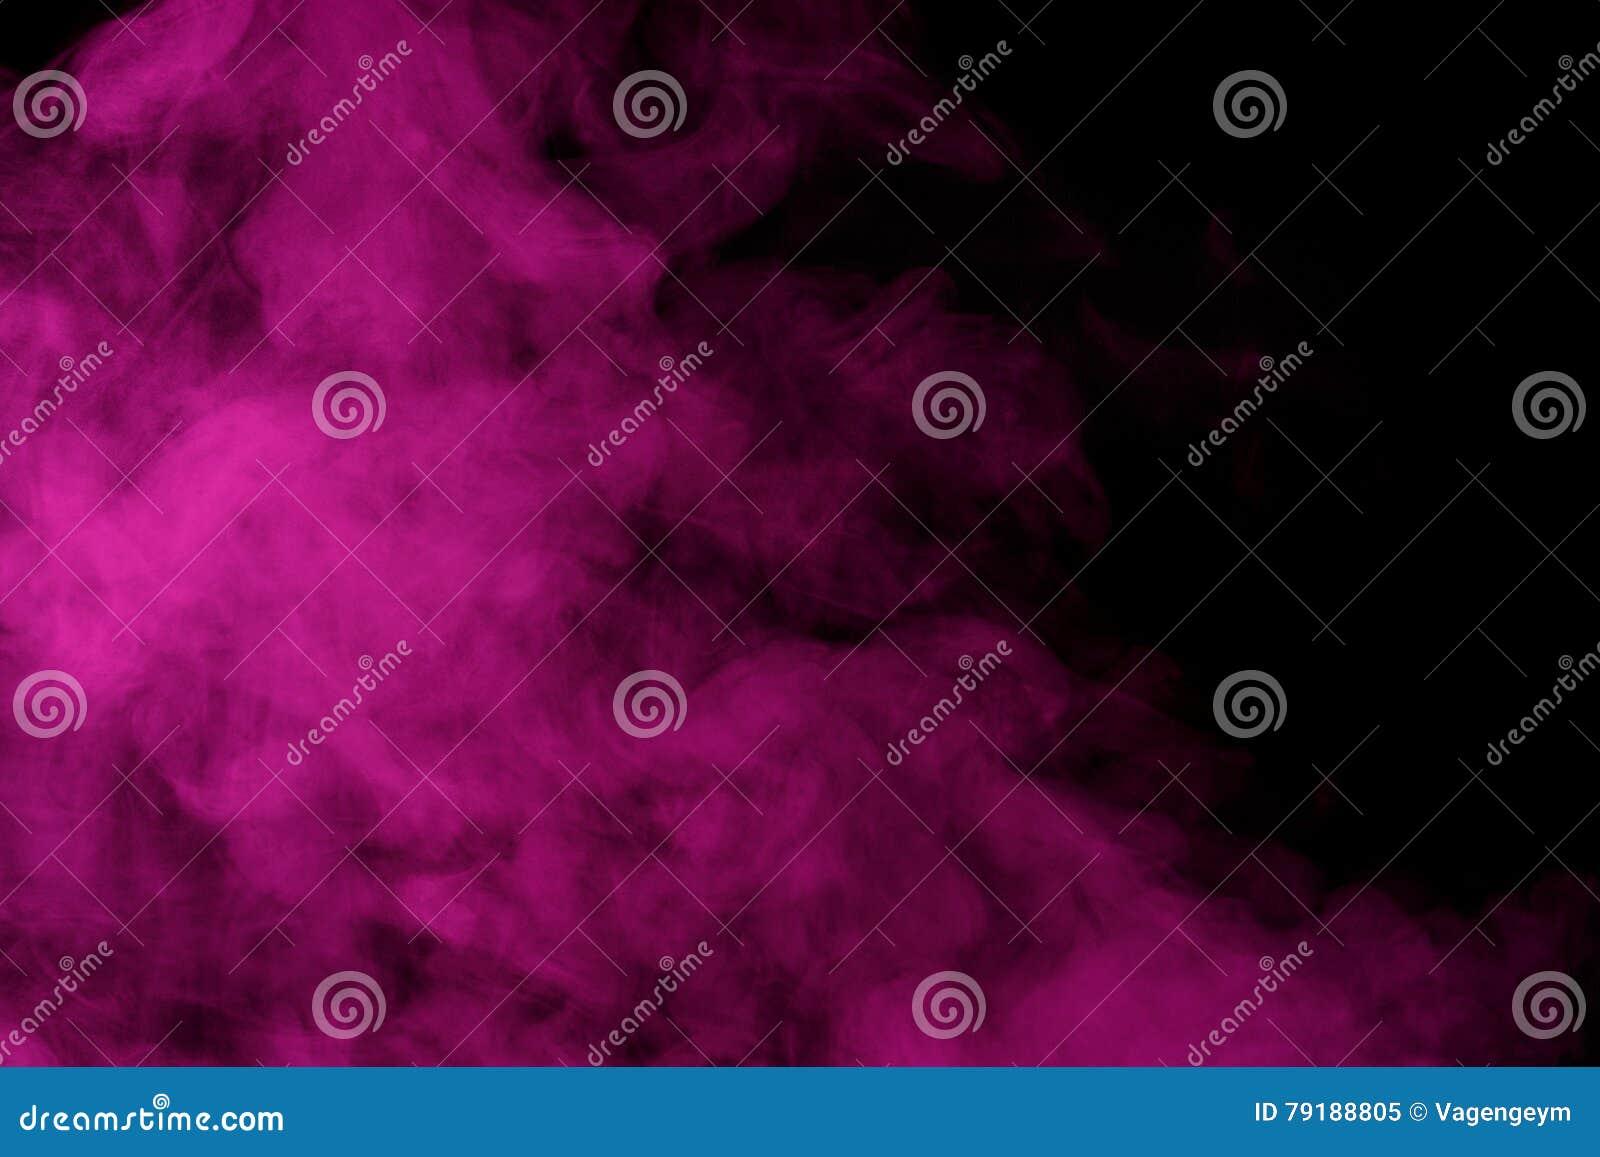 Purple water vapor